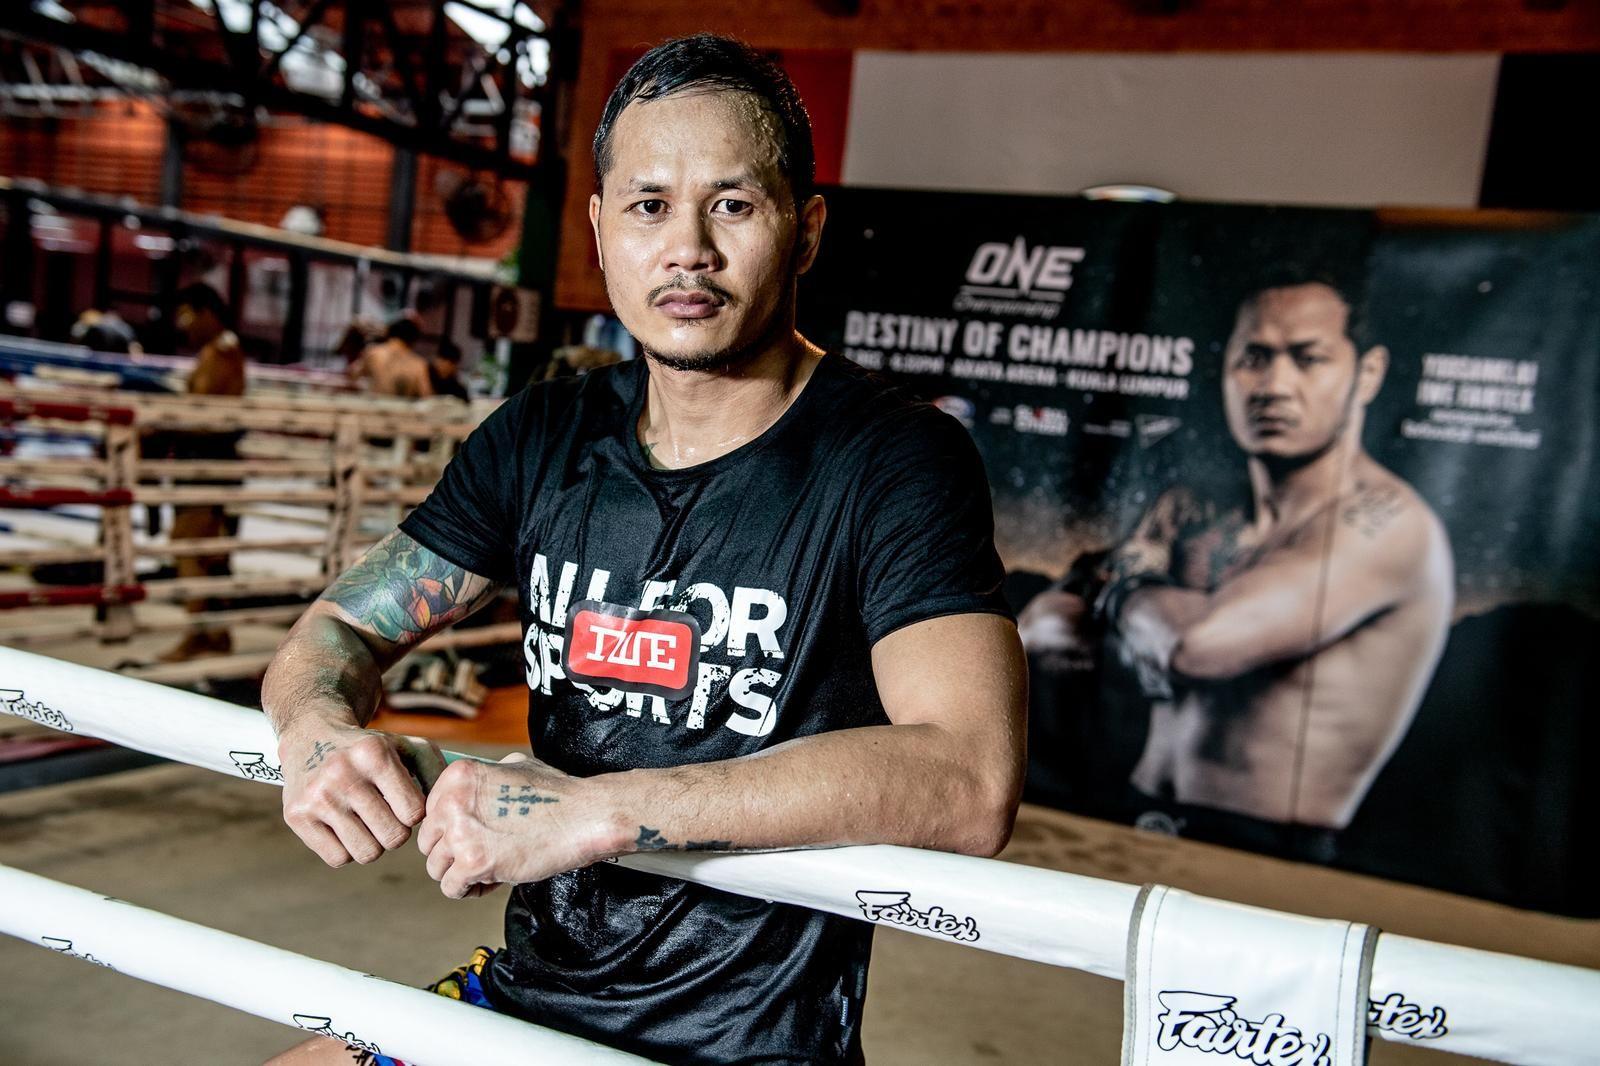 Muay Thai legend Yodsanklai IWE Fairtex stands in the ring